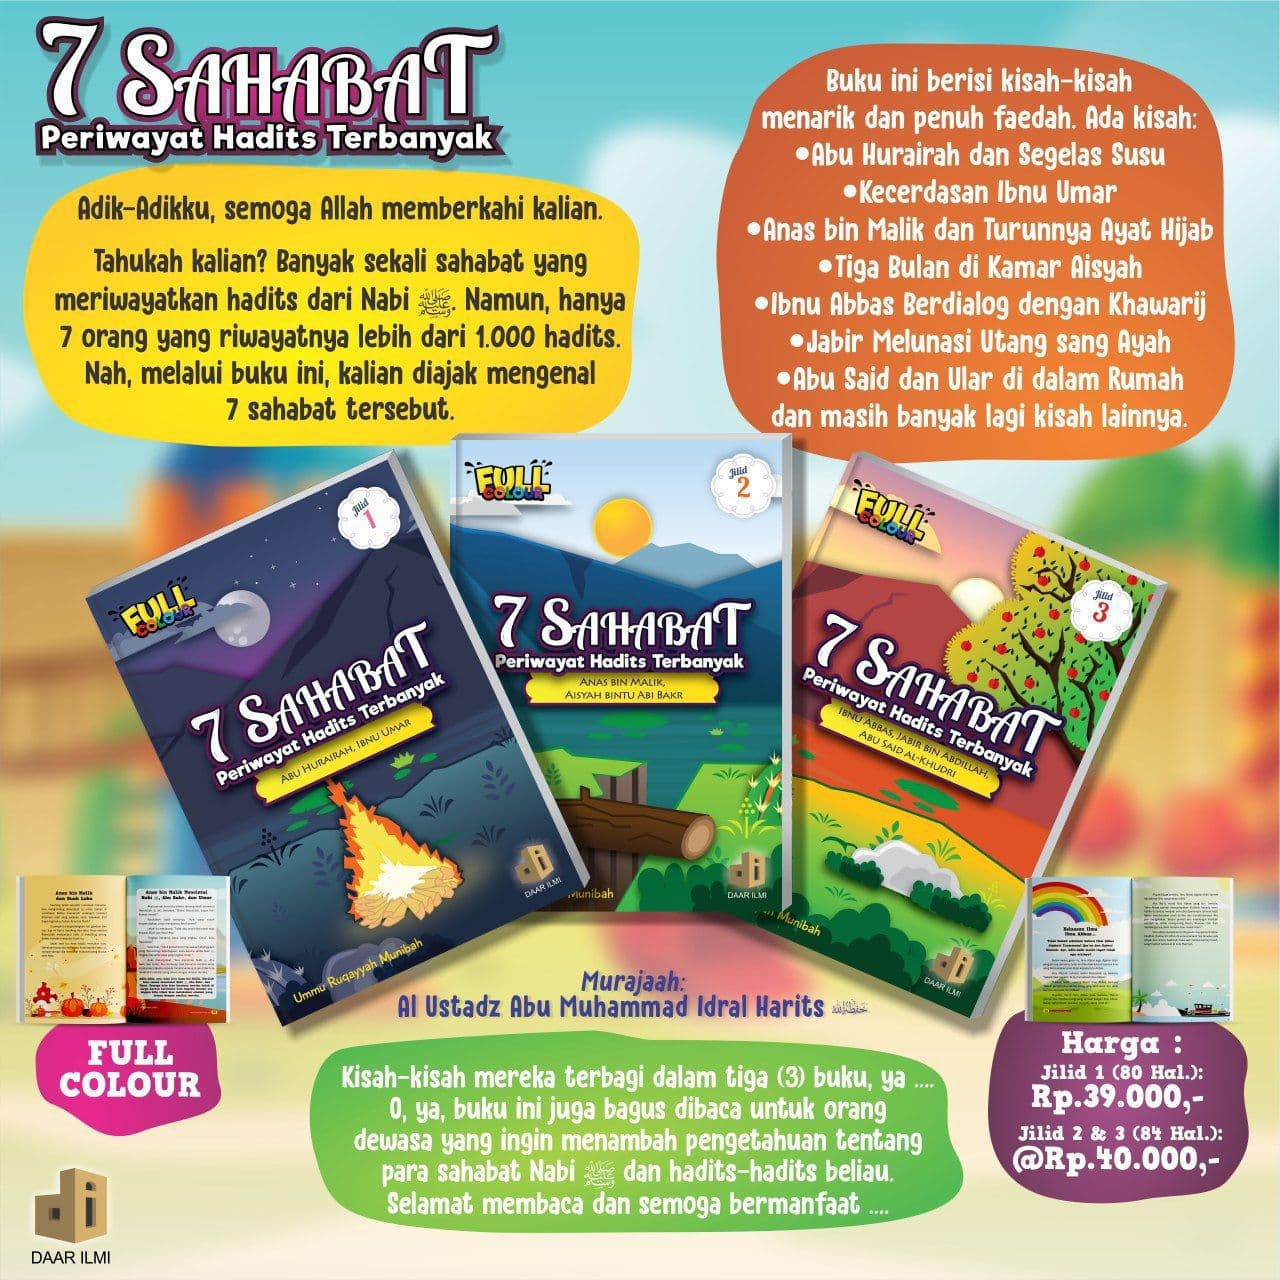 Buku Anak 7 Sahabat Periwayat Hadits Terbanyak Jilid 1-2-3 Daar Ilmi